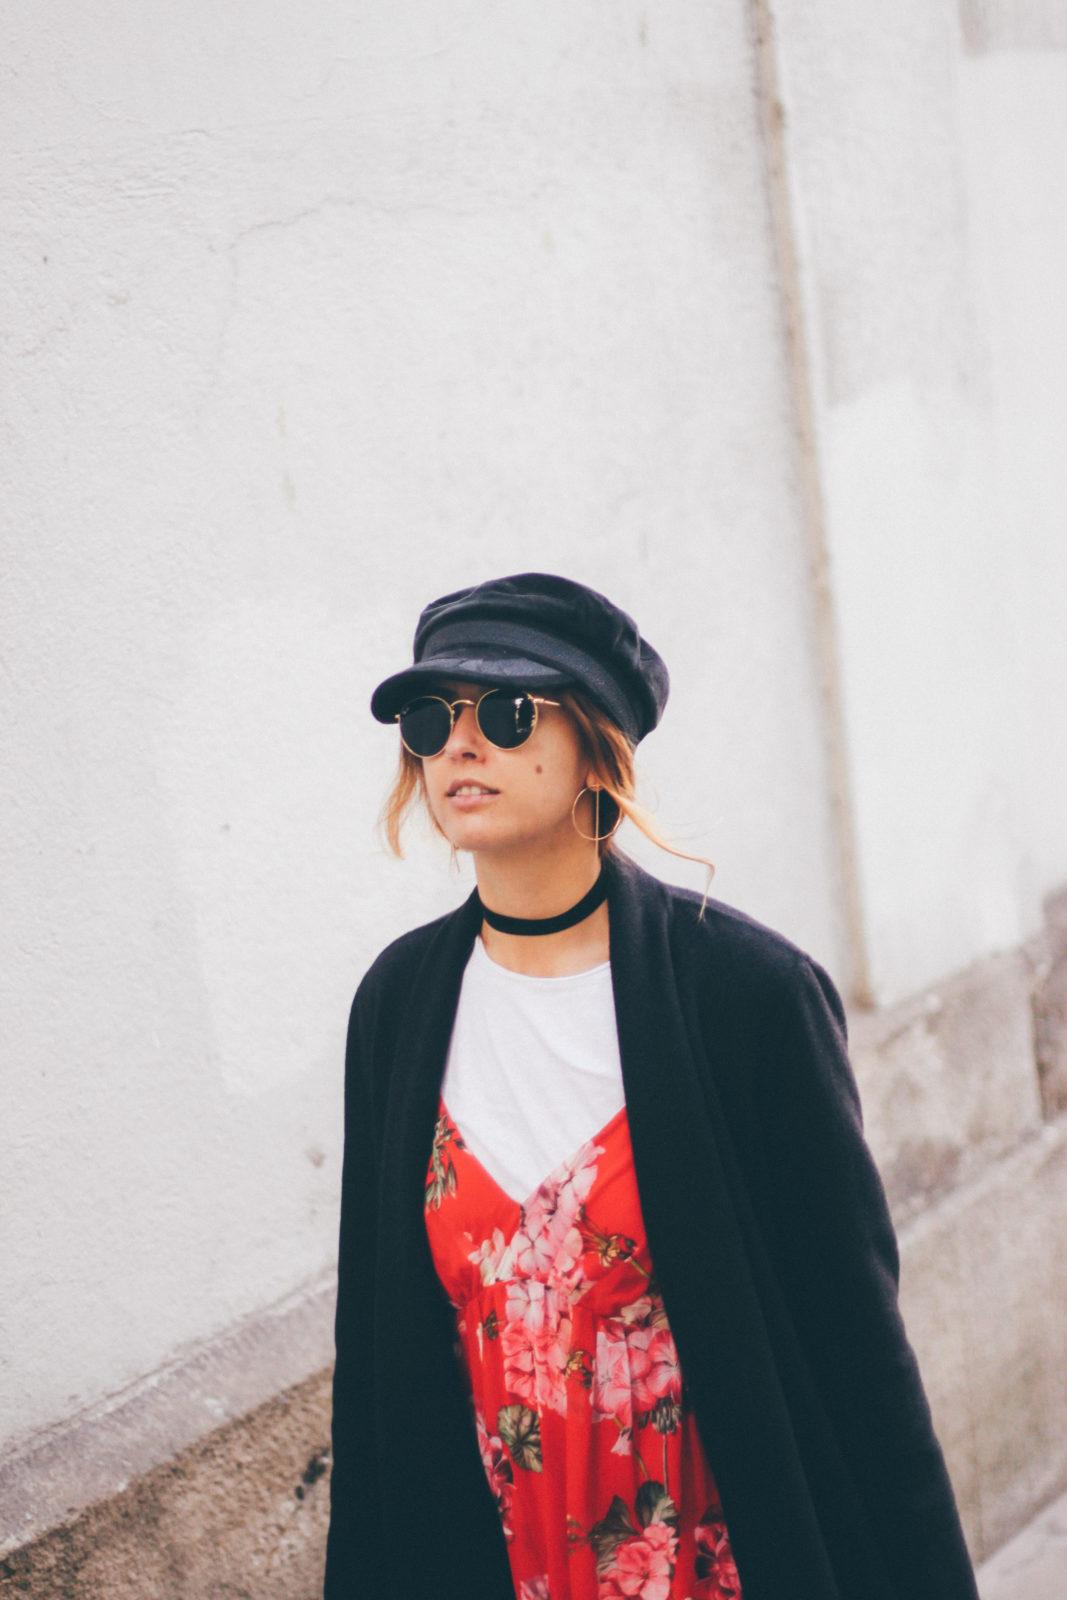 baker_boy_hat_vestido_con_camiseta_gorra_marinera_botines_hebillas_fall_2016_trends_street_style_outfits_donkeycool-13